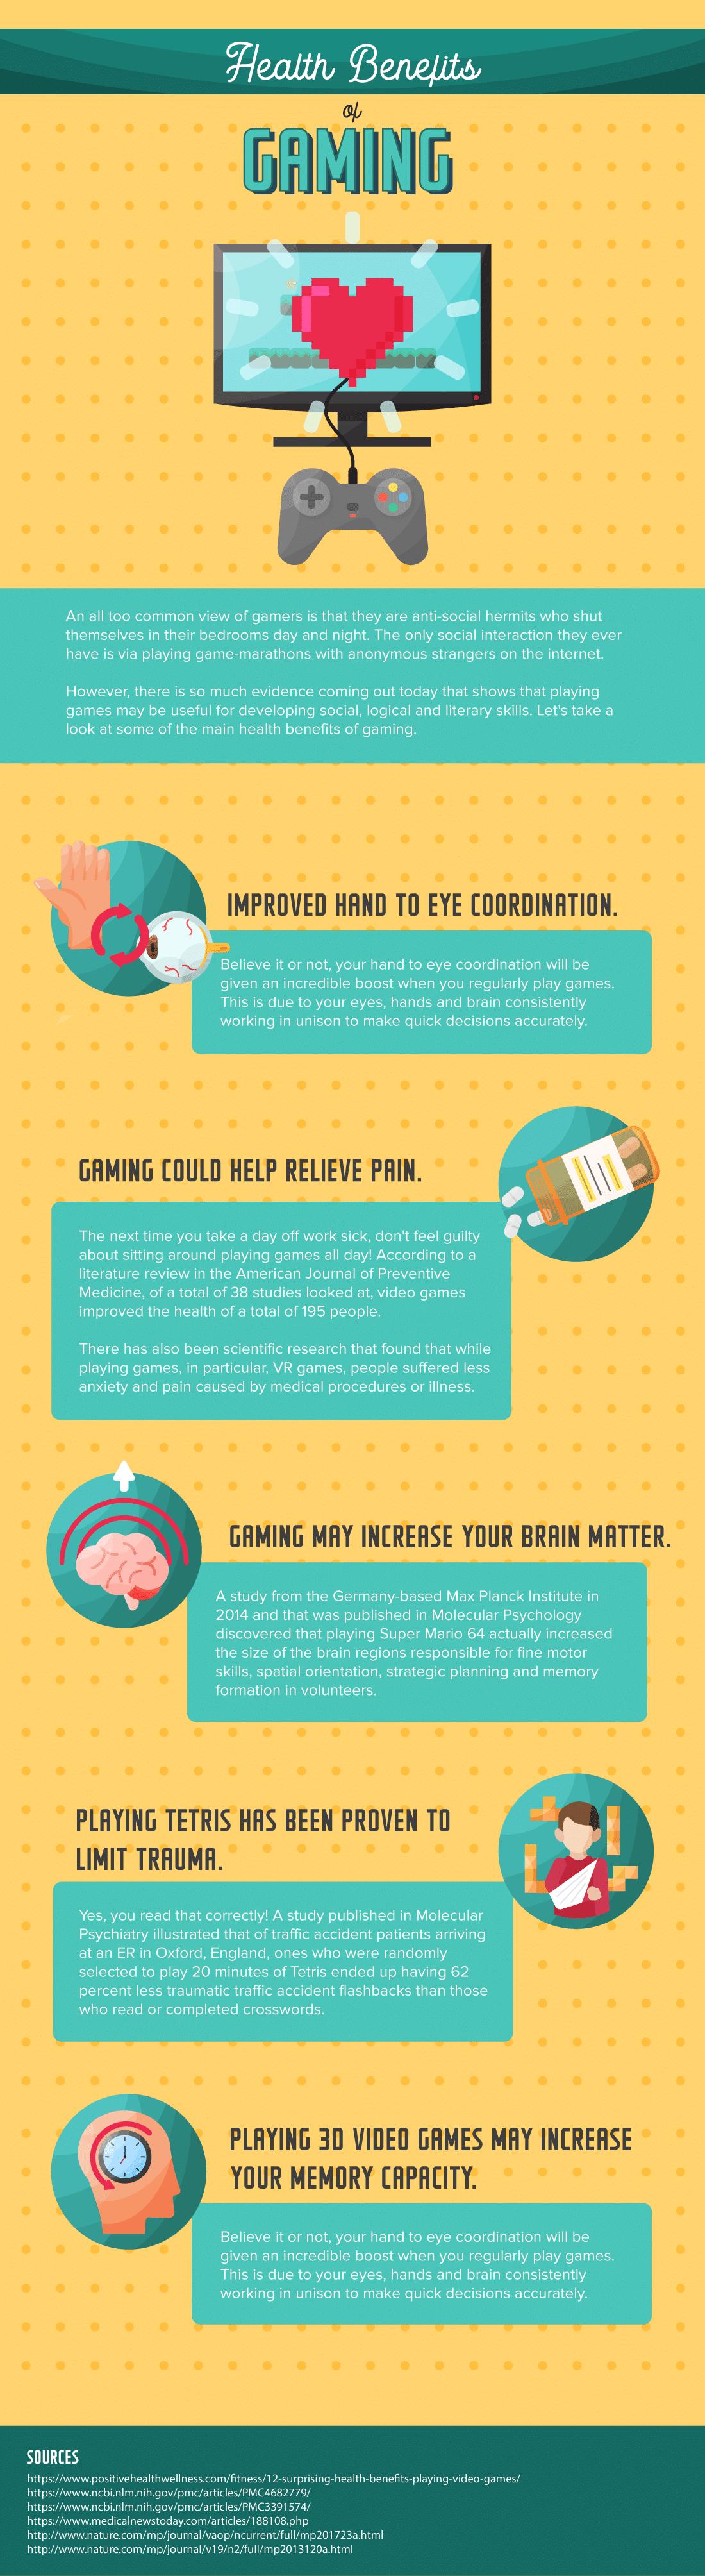 health-benefits-gaming